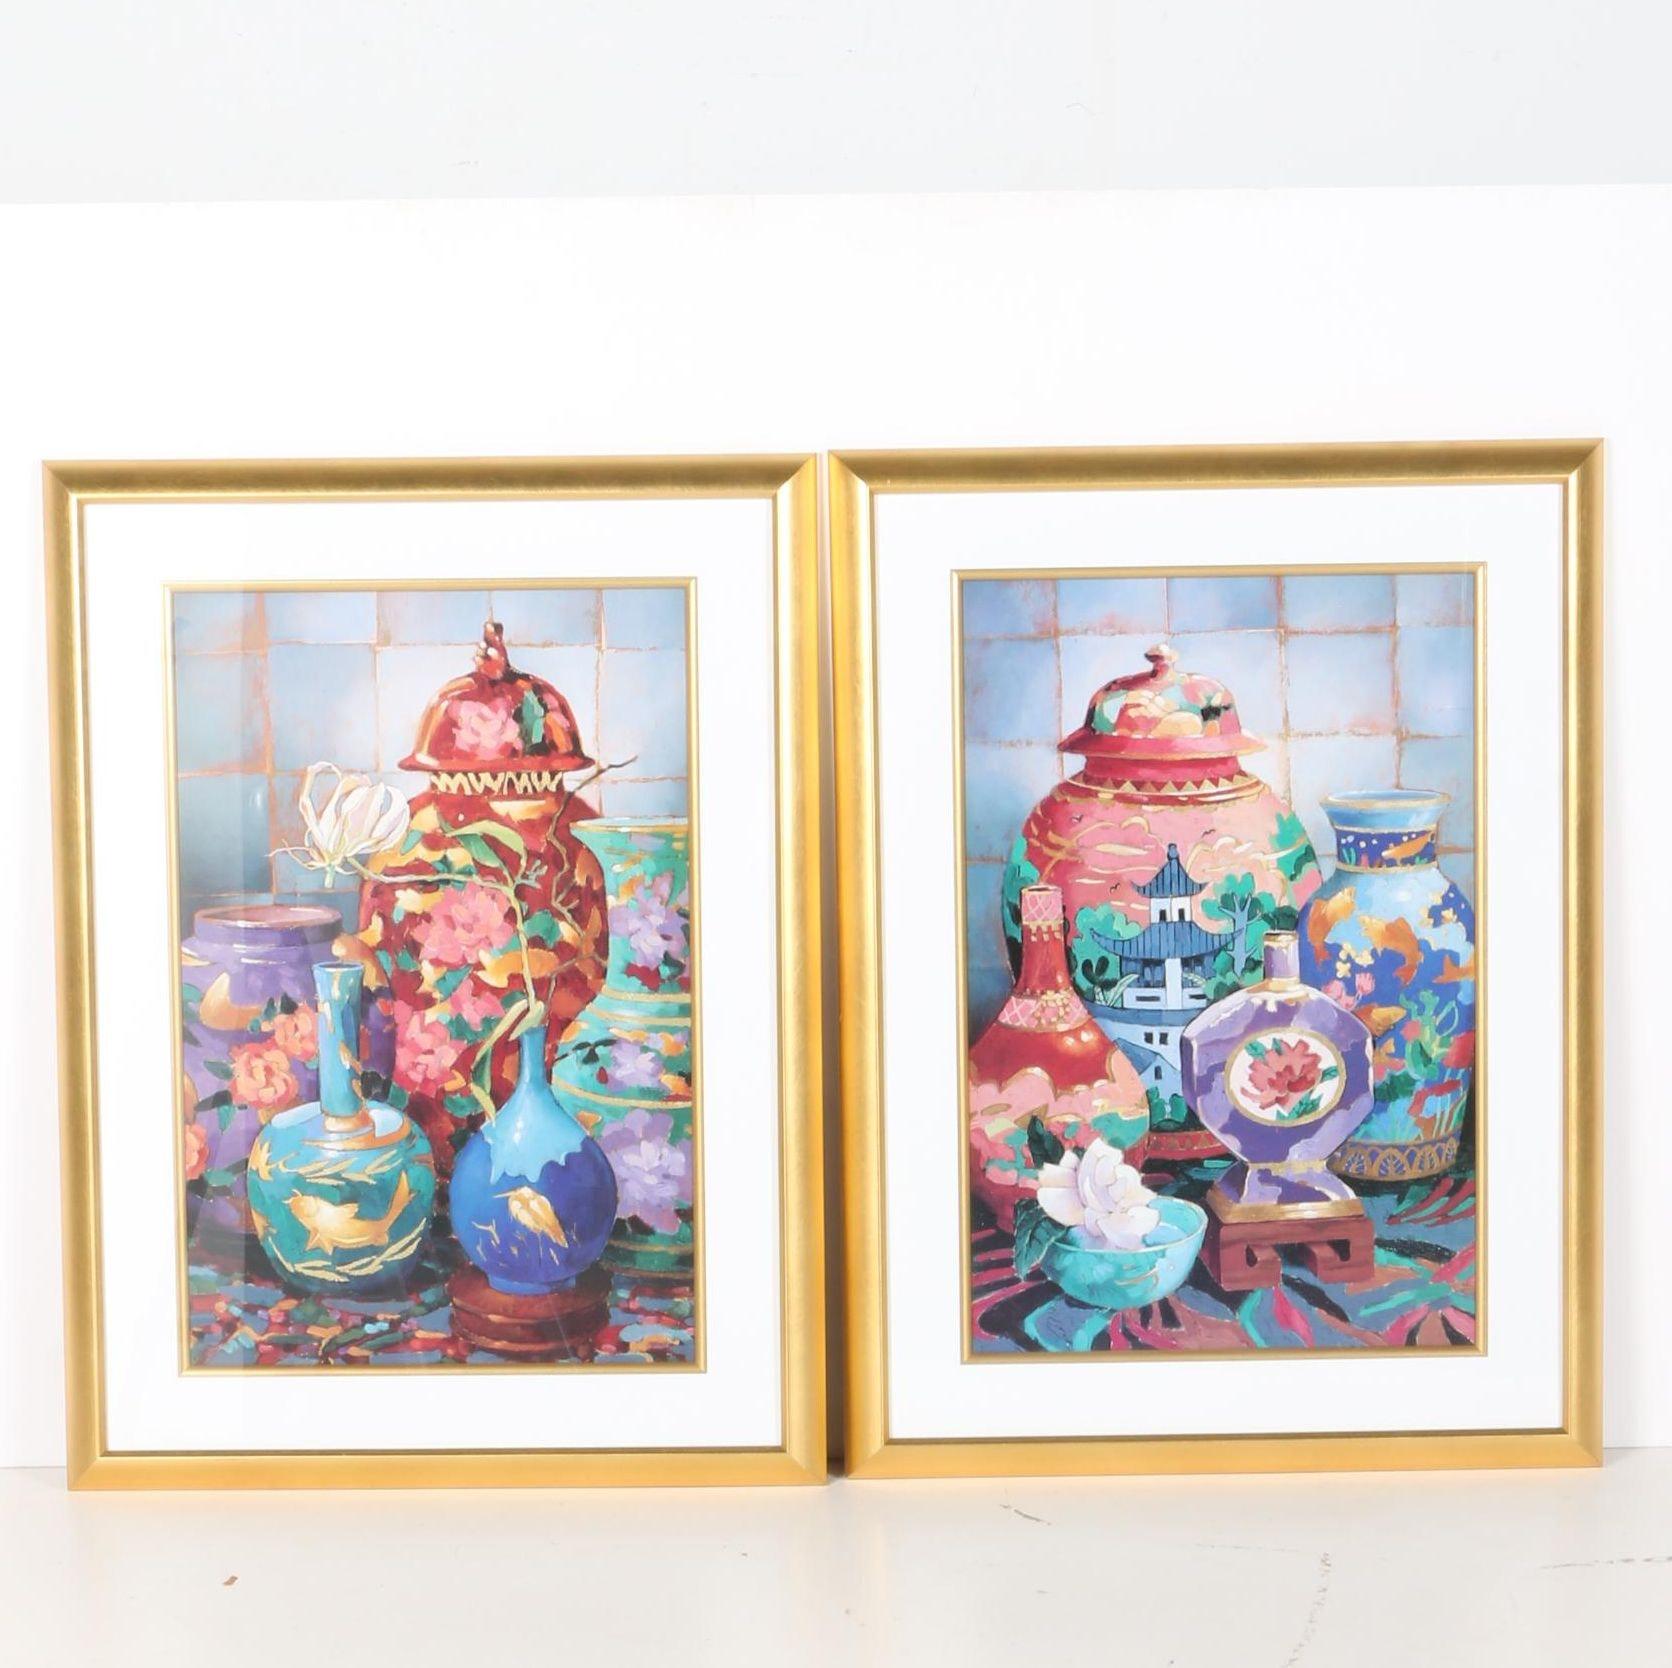 Framed Still Life Offset Lithographs on Paper